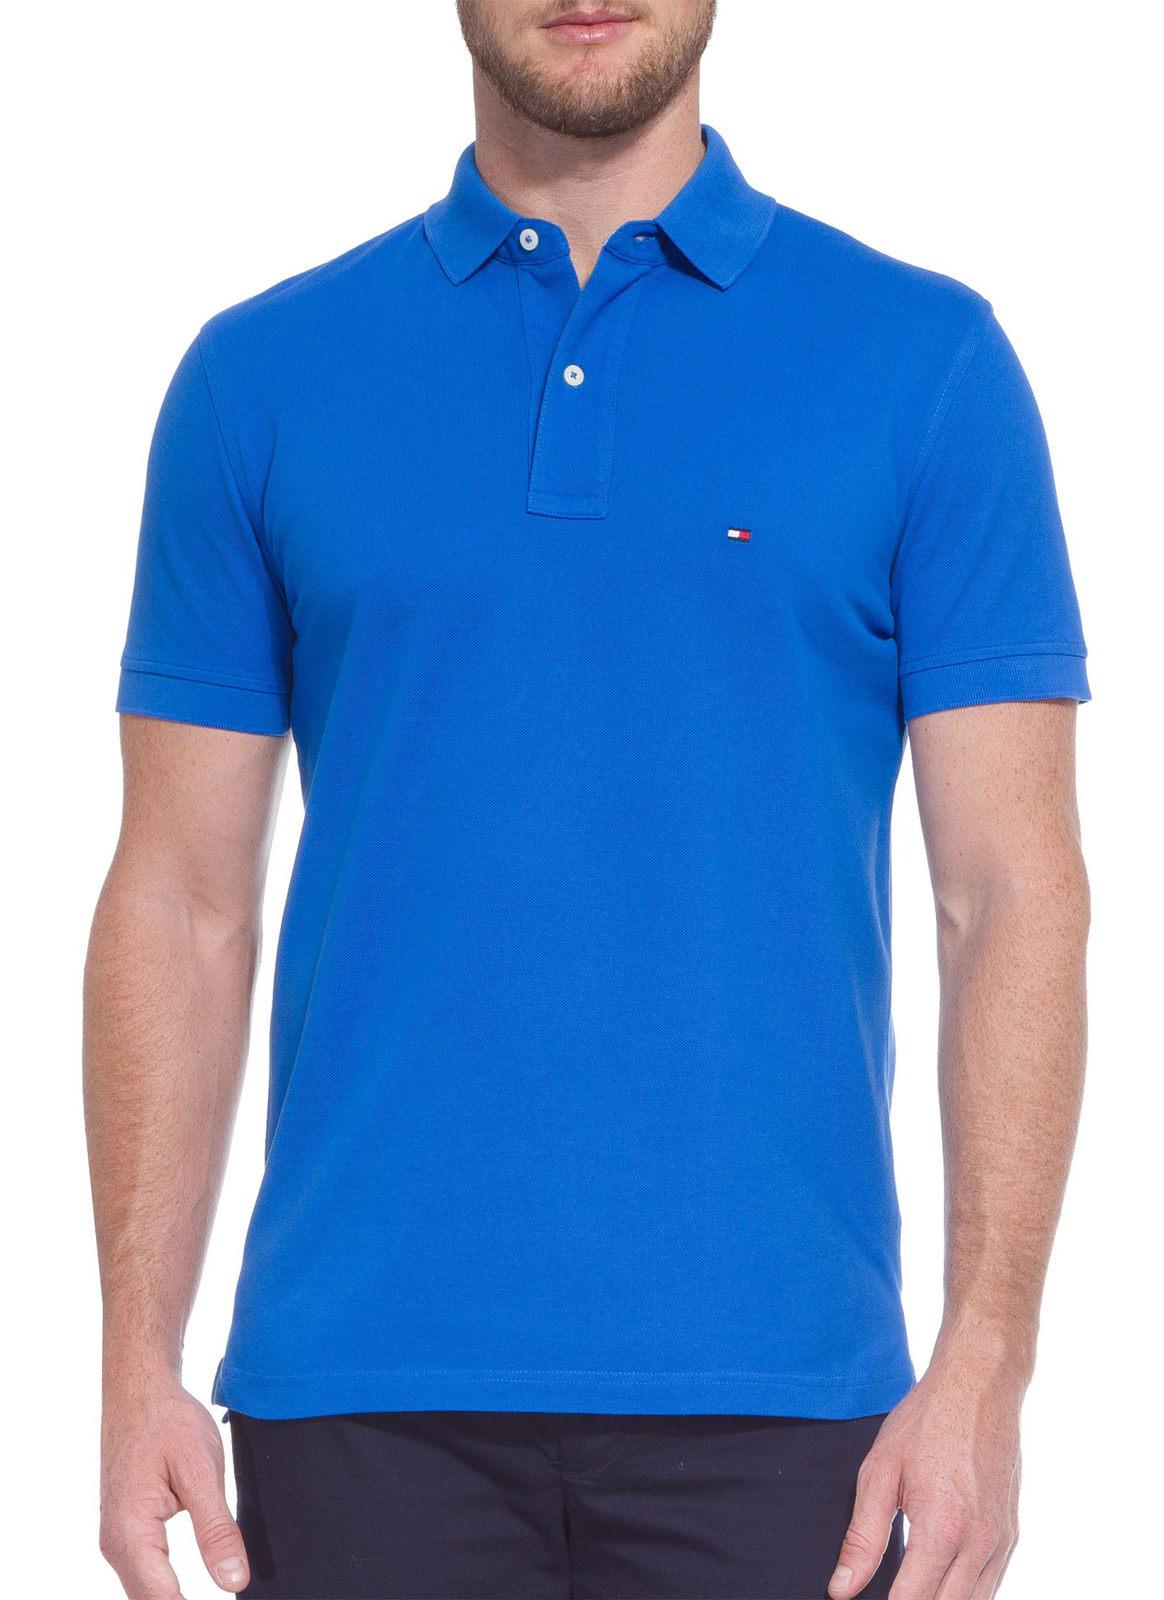 Polo Tommy Hilfiger Masculina Regular Fit Lisa Azul Royal